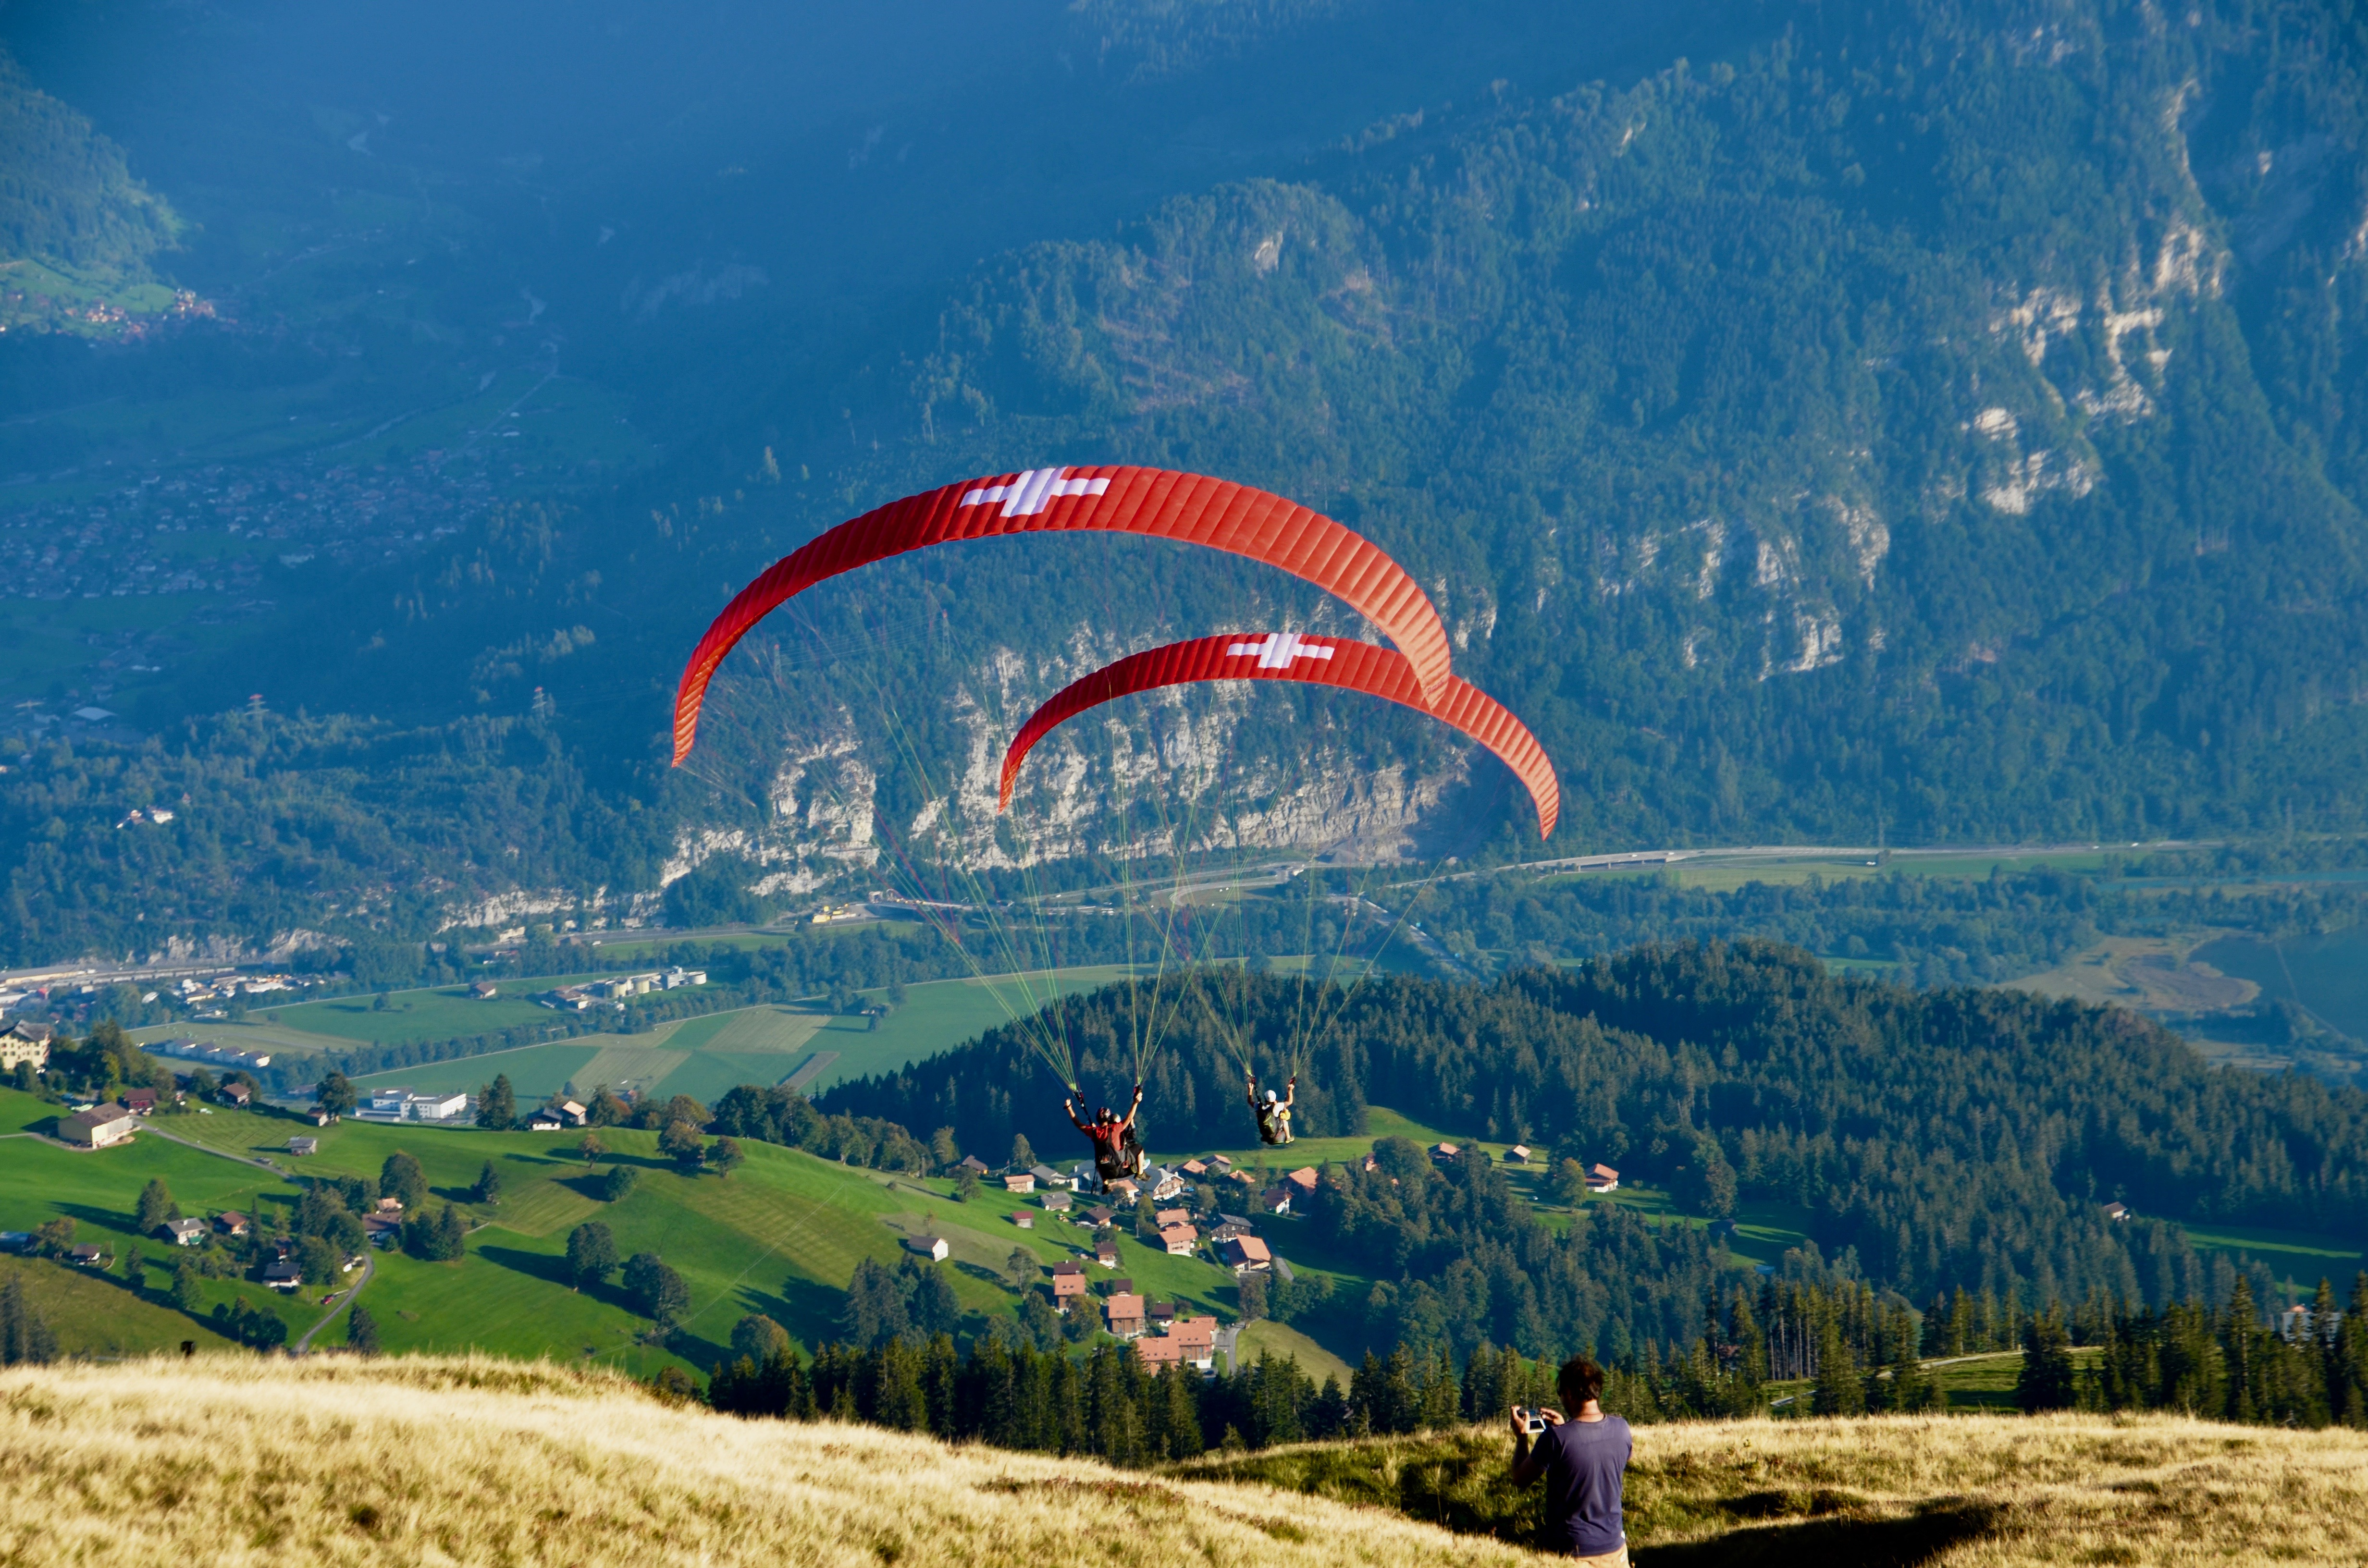 swiss-paragliding-sommer-paraglider